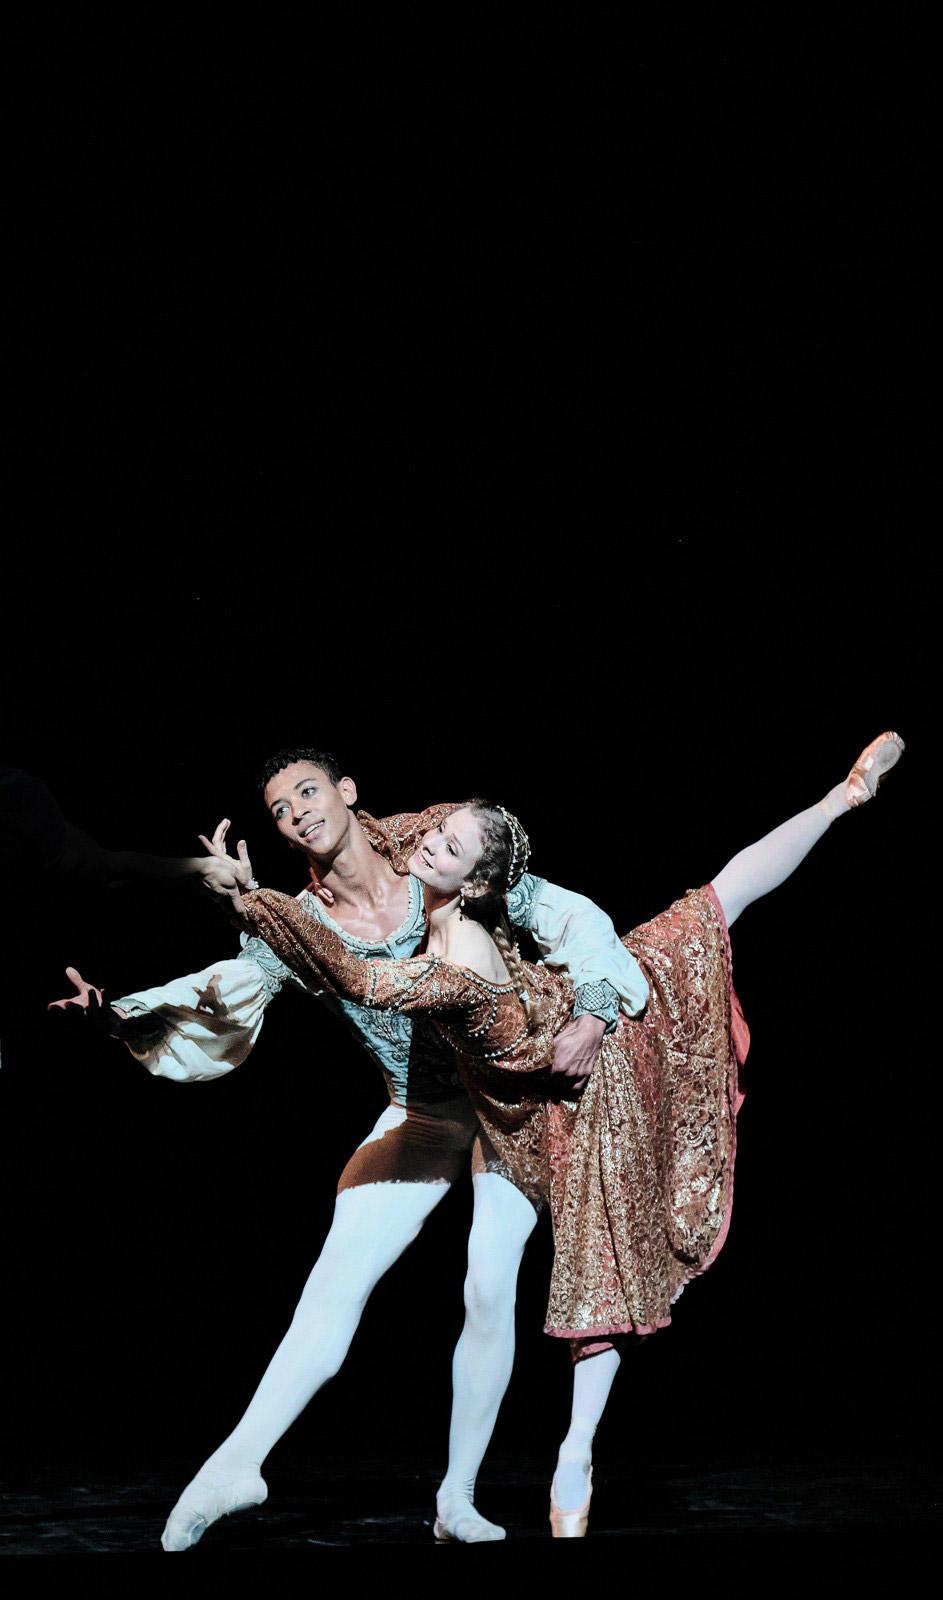 OPB-Romeo-et-Juliette-5-Diop-Baulac--C-Agathe-Poupeney.jpg